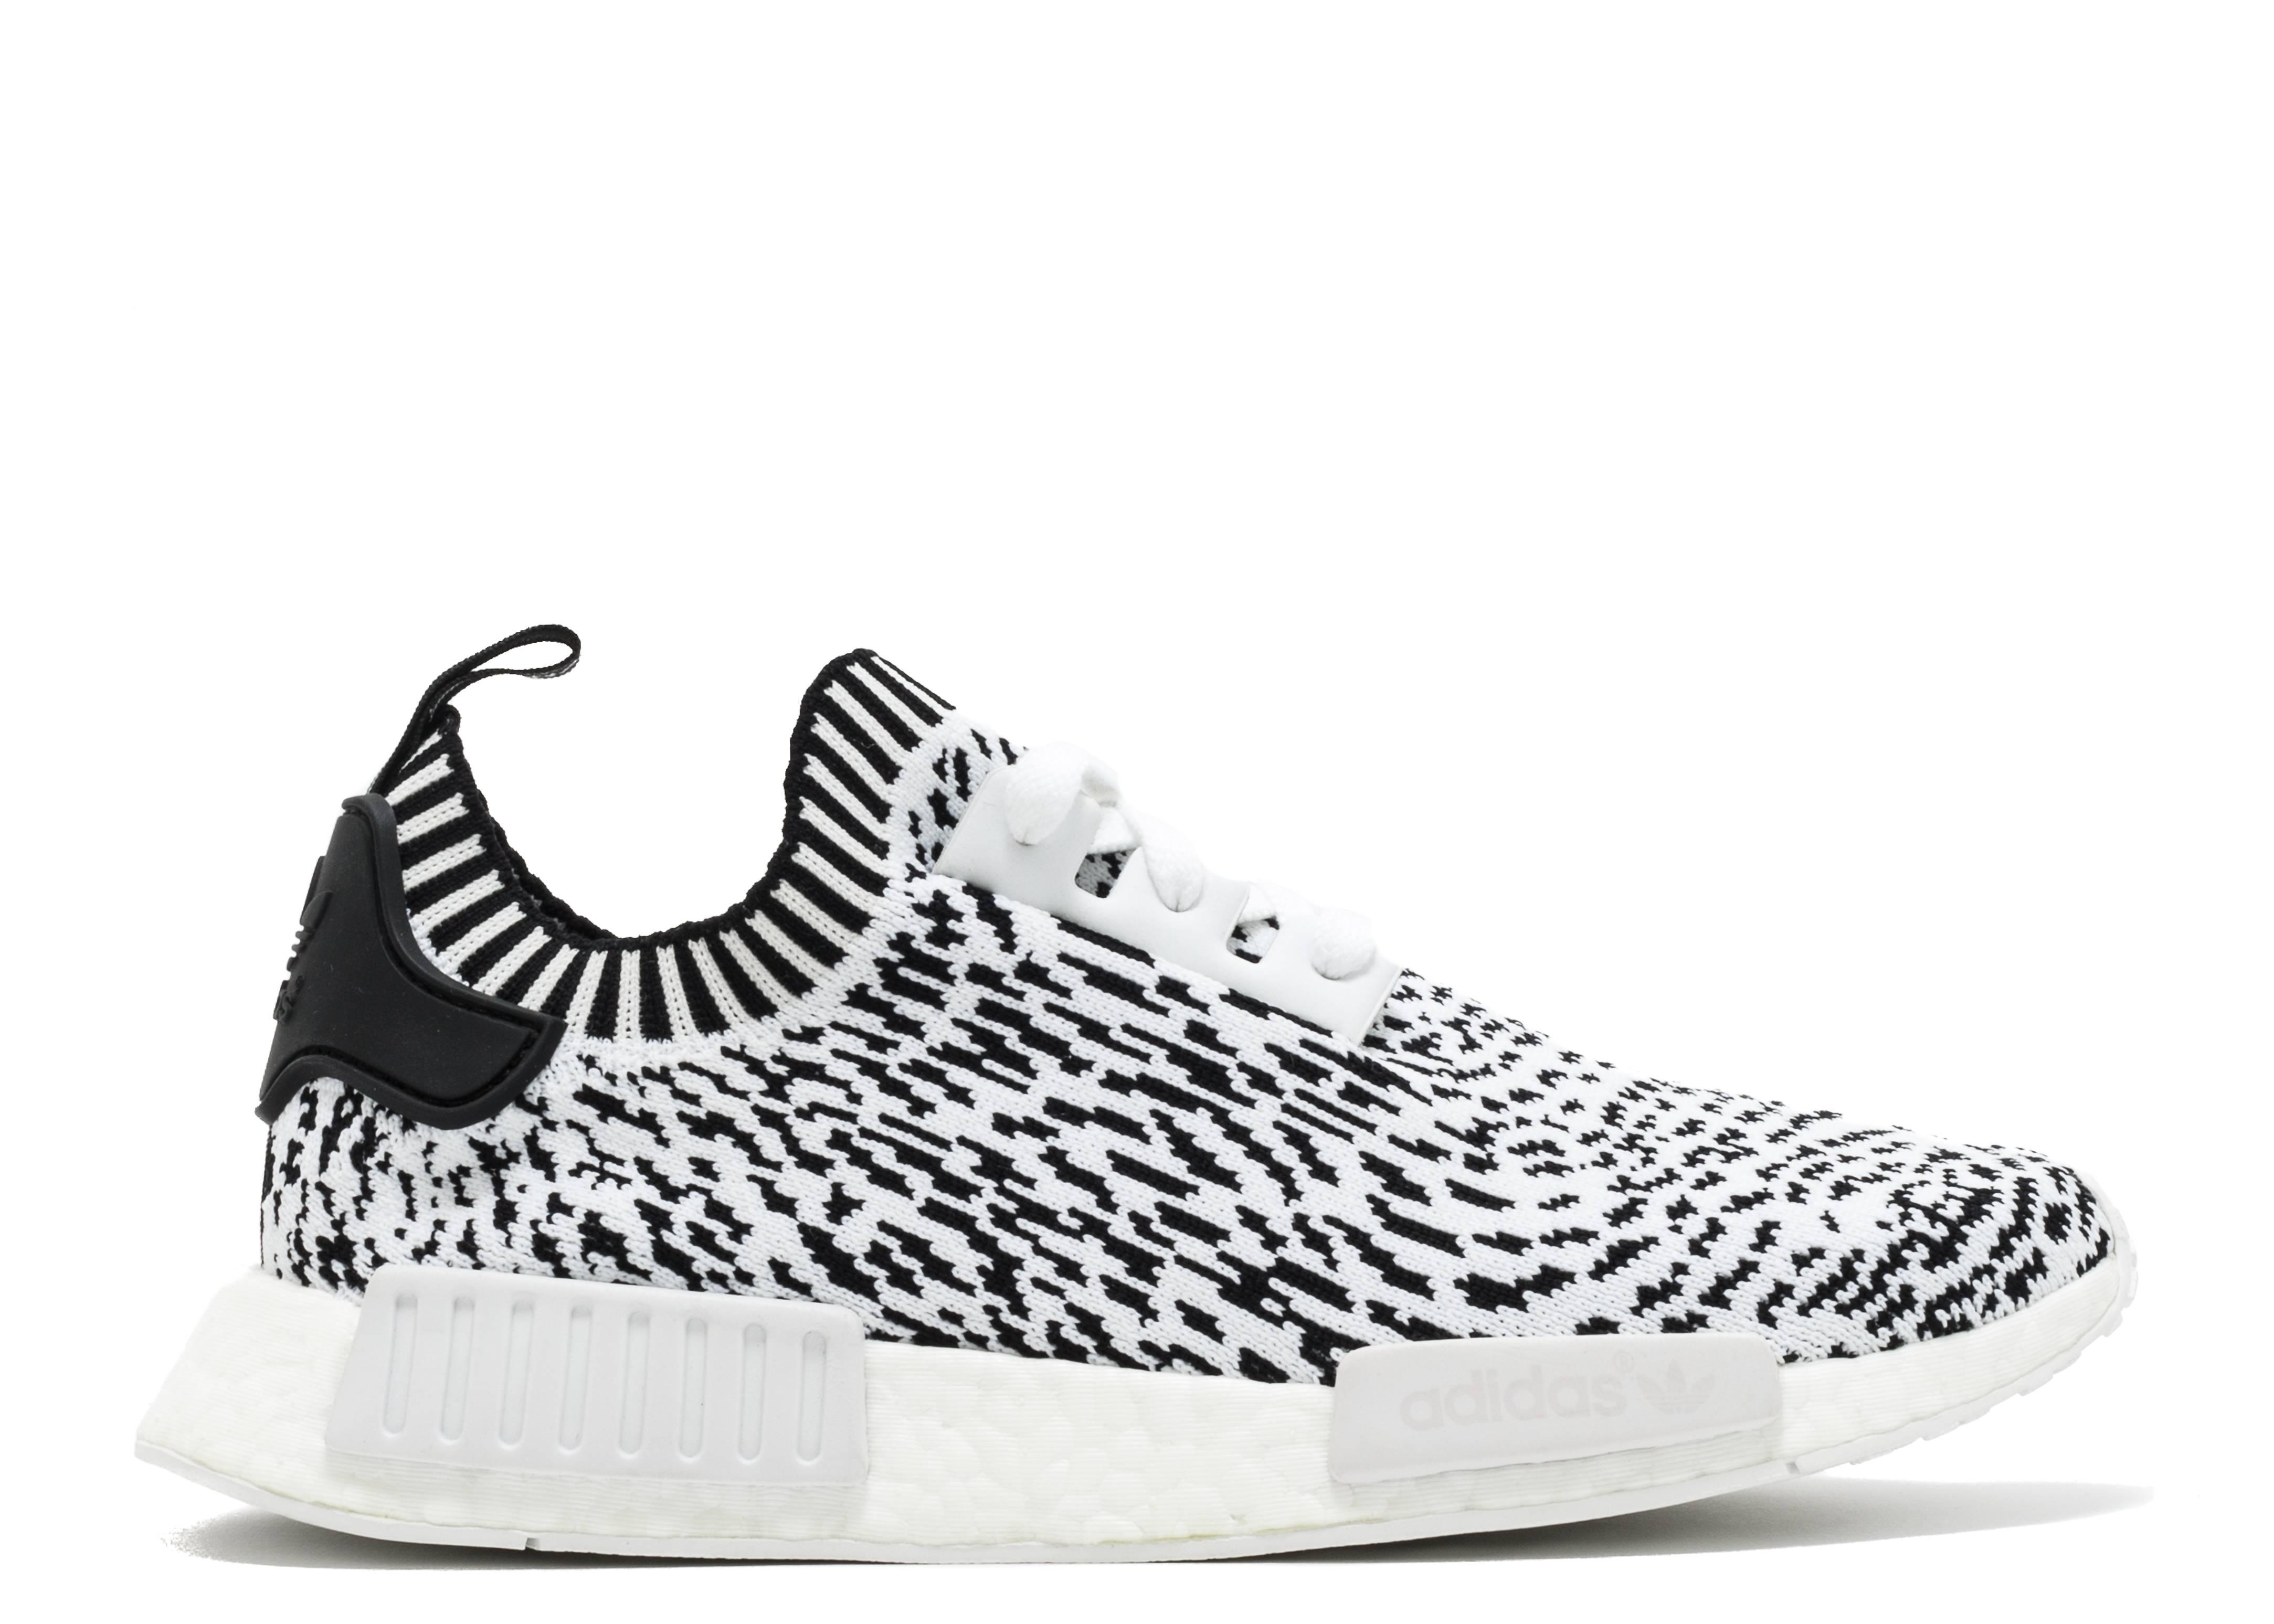 110c691aa NMD R1 PK - Adidas - bz0219 - white black white